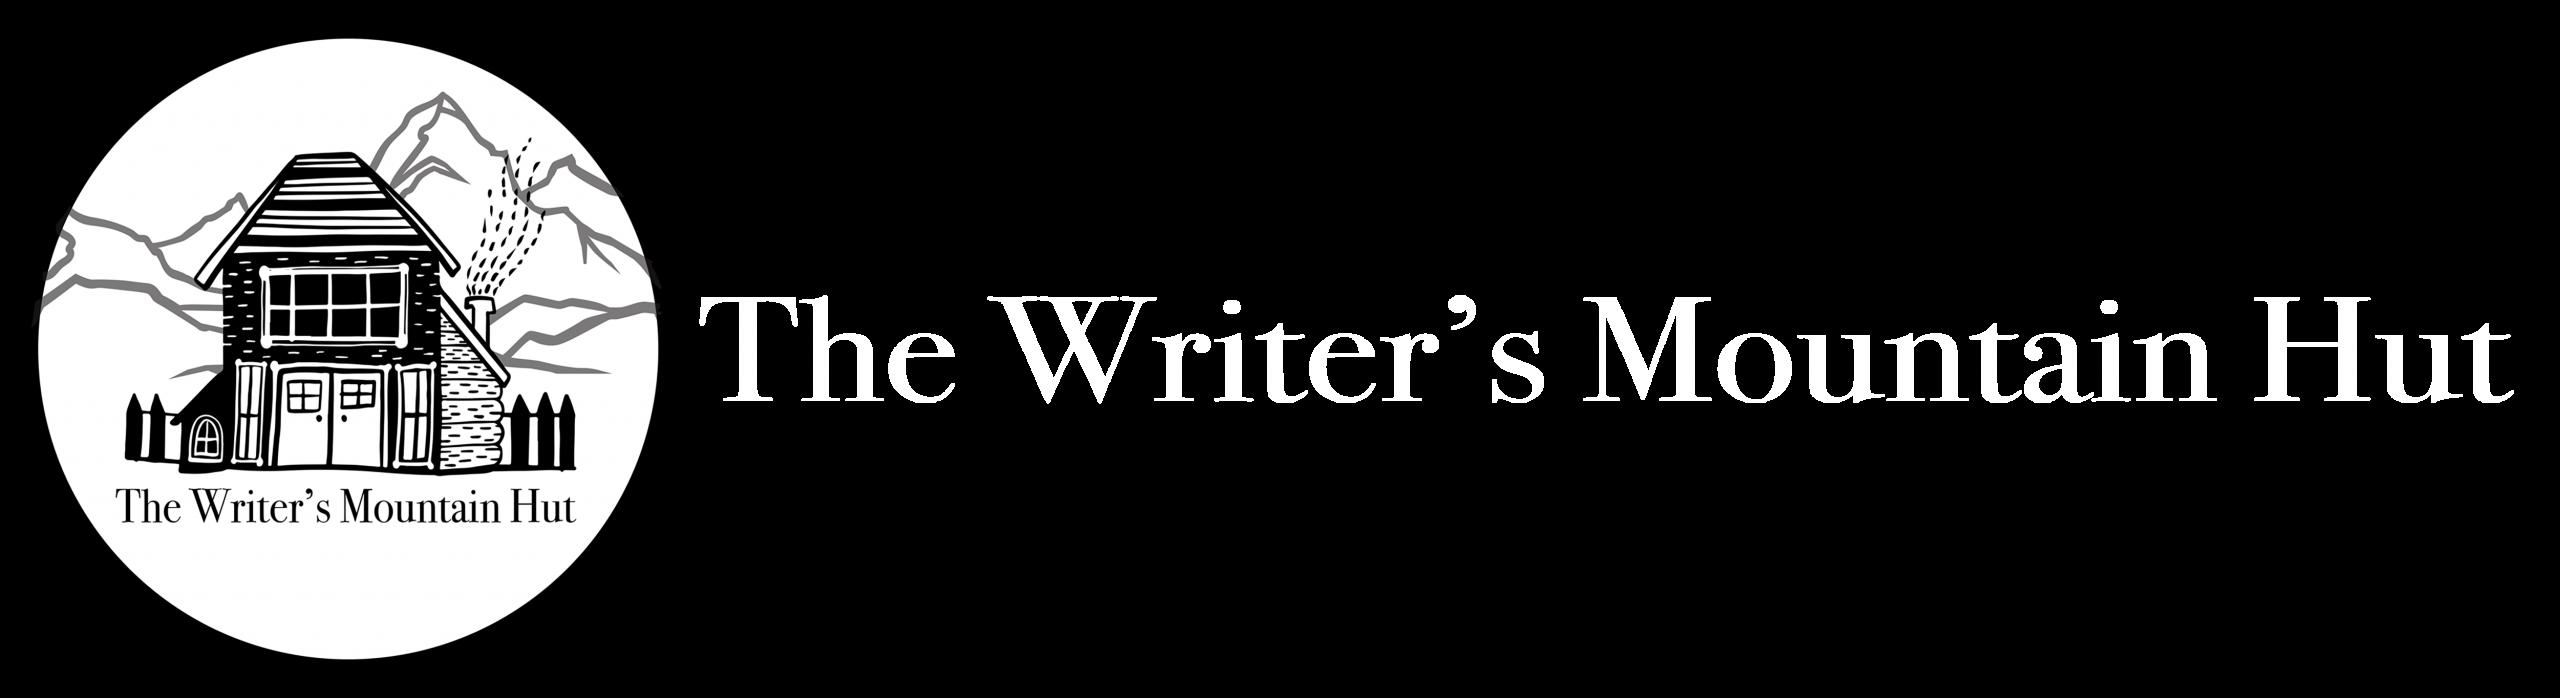 The Writer's Mountain Hut